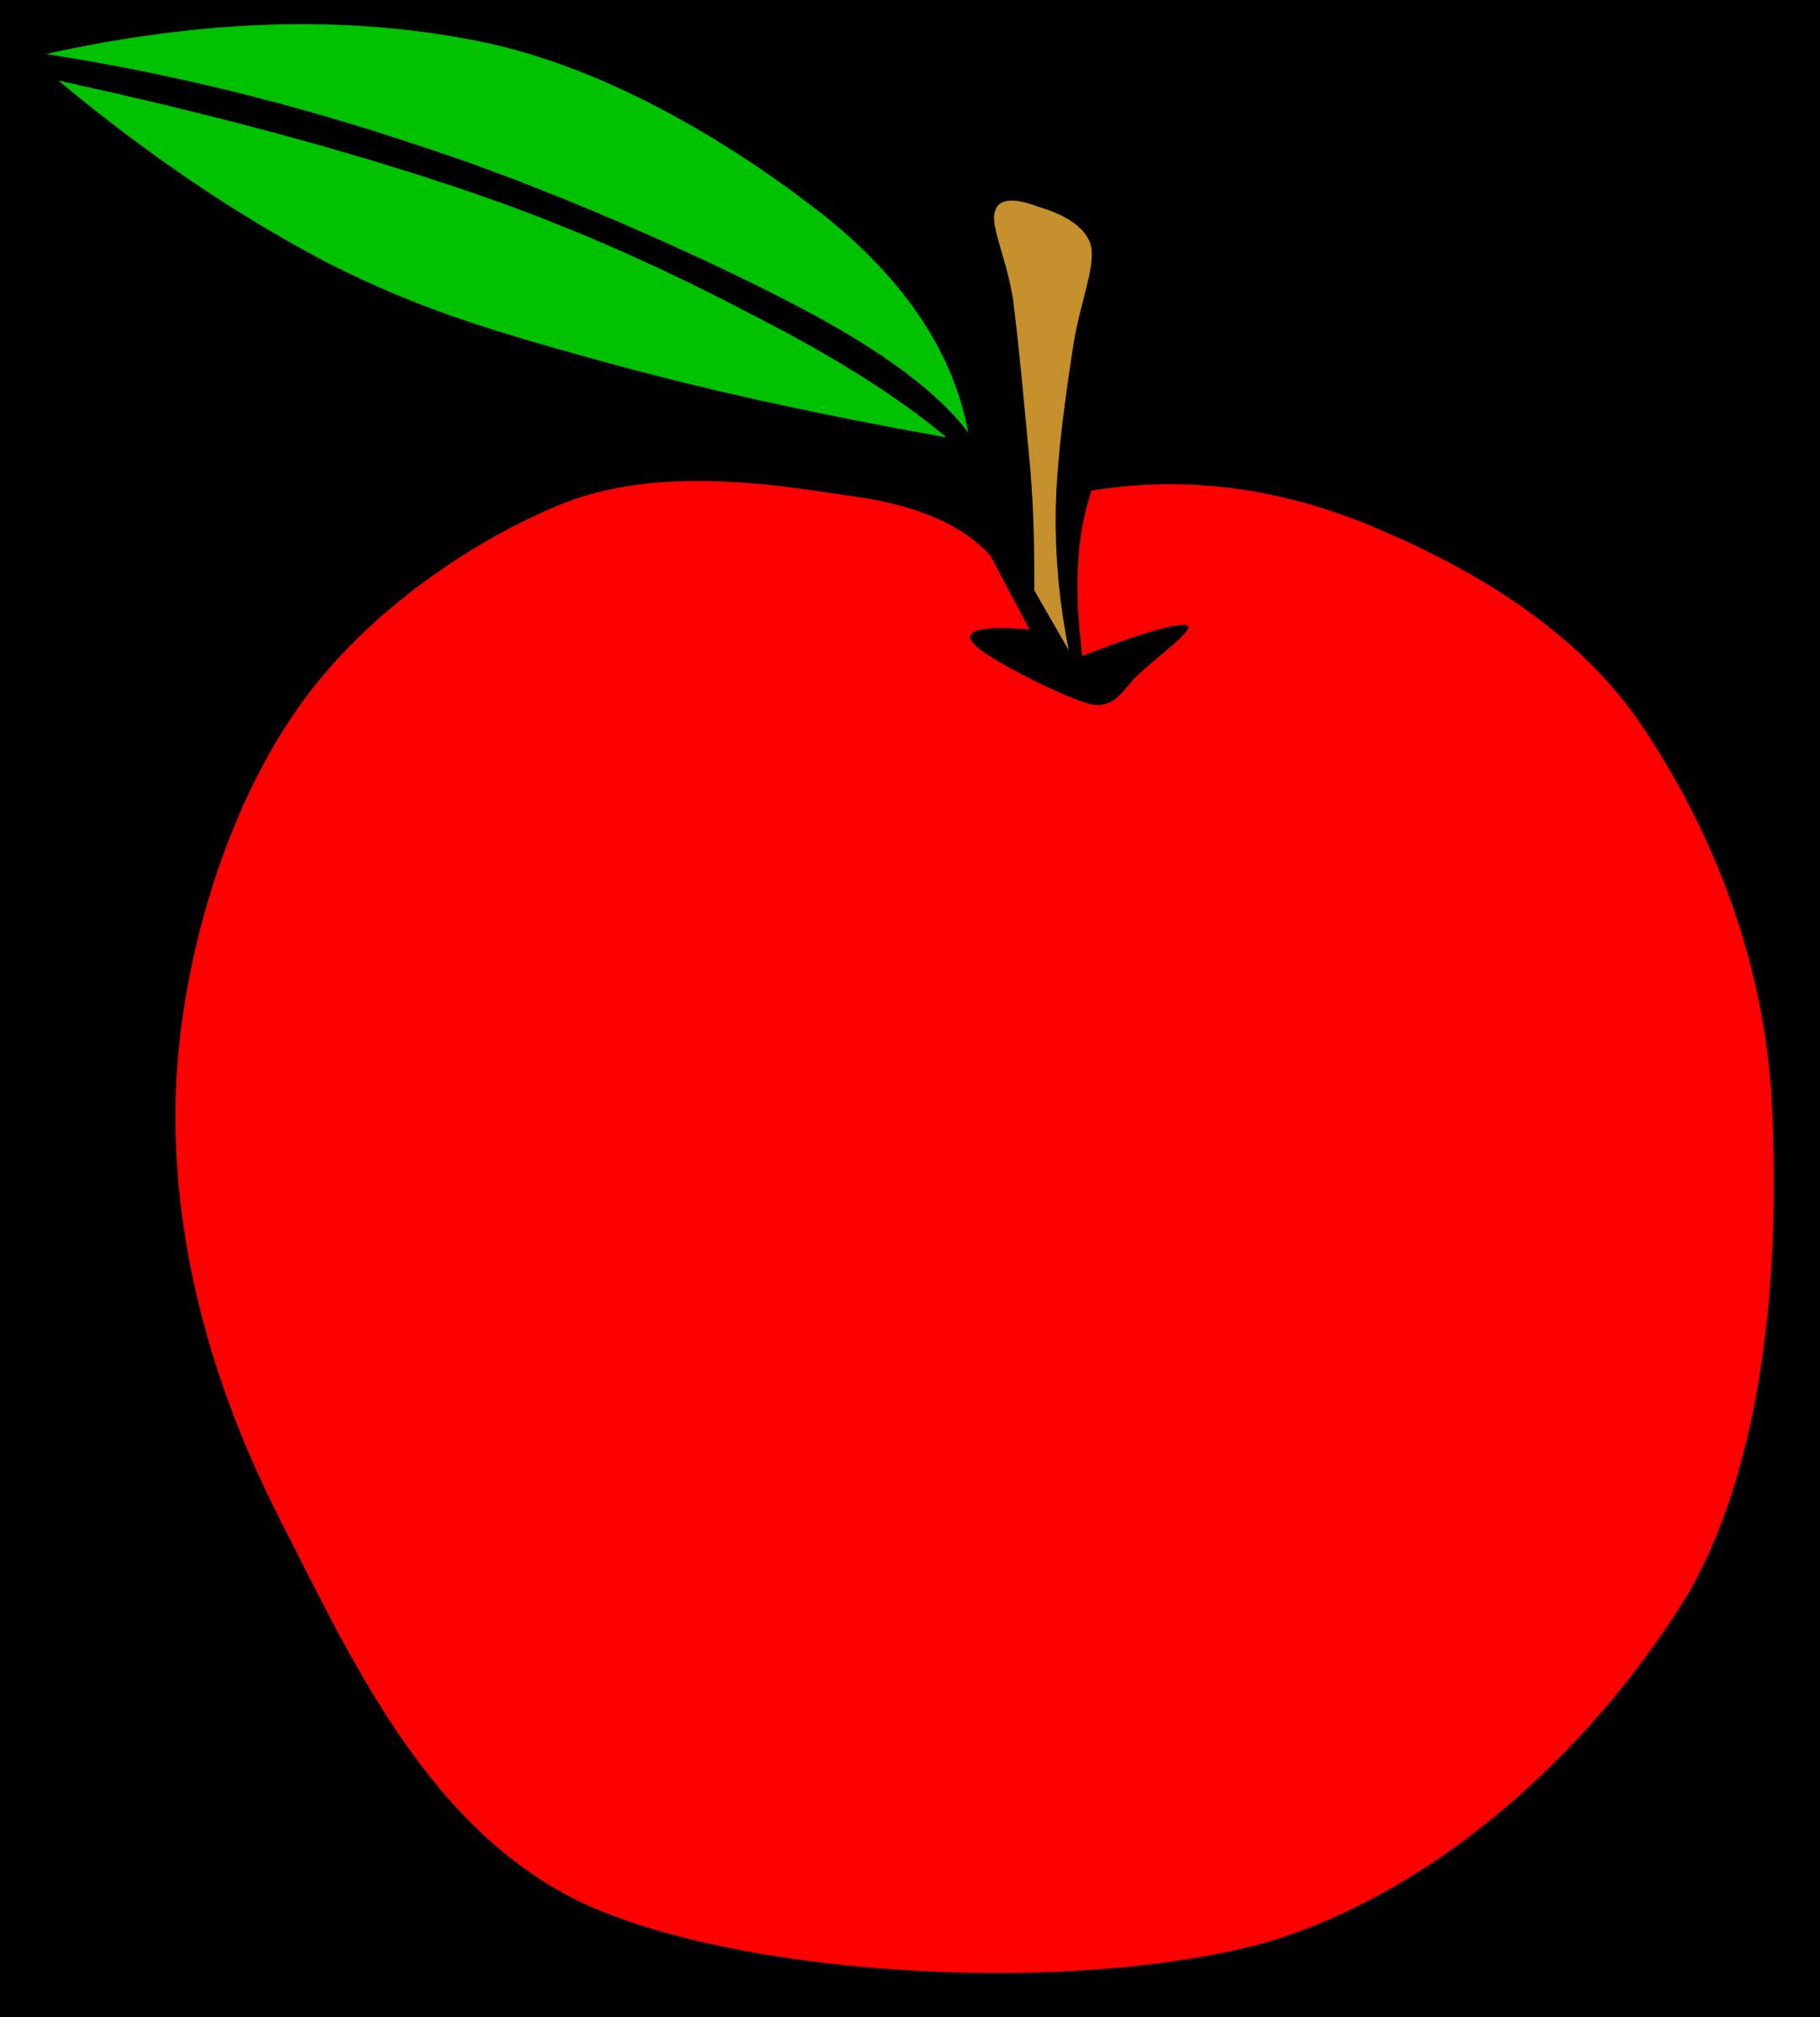 Apple clipart preschool, Apple preschool Transparent FREE